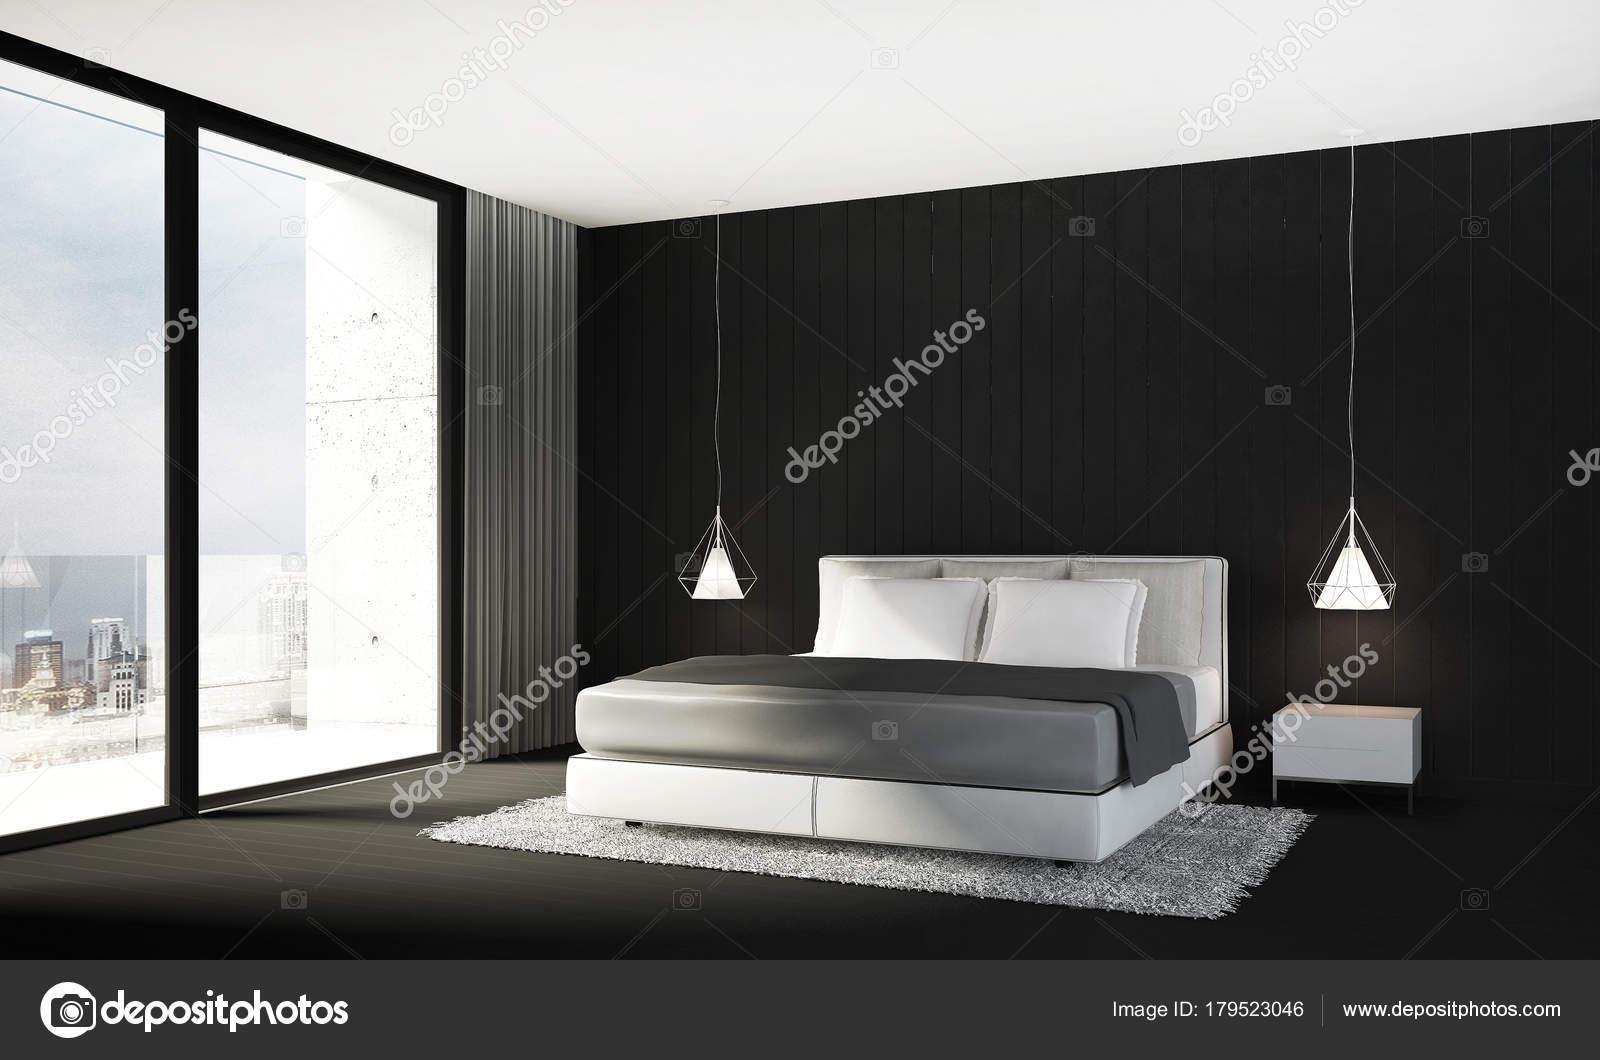 Rendu Decoration Chambre Coucher Fond Texture Mur Noir